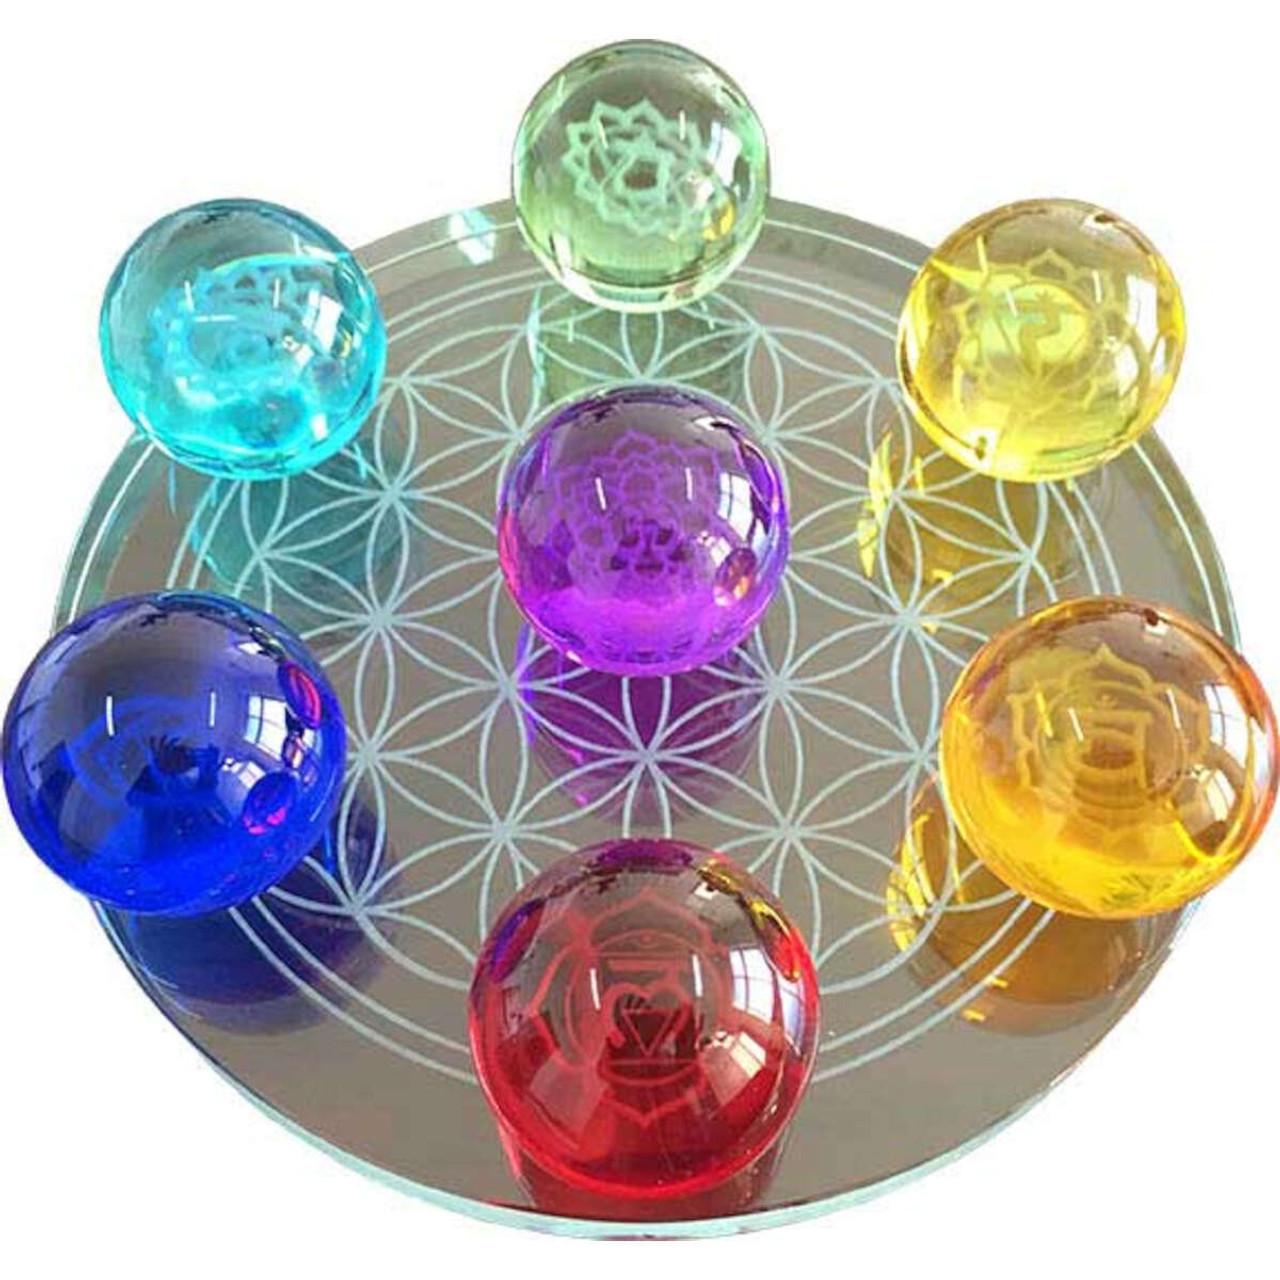 7 Chakra Flower of Life Crystal Balls Set